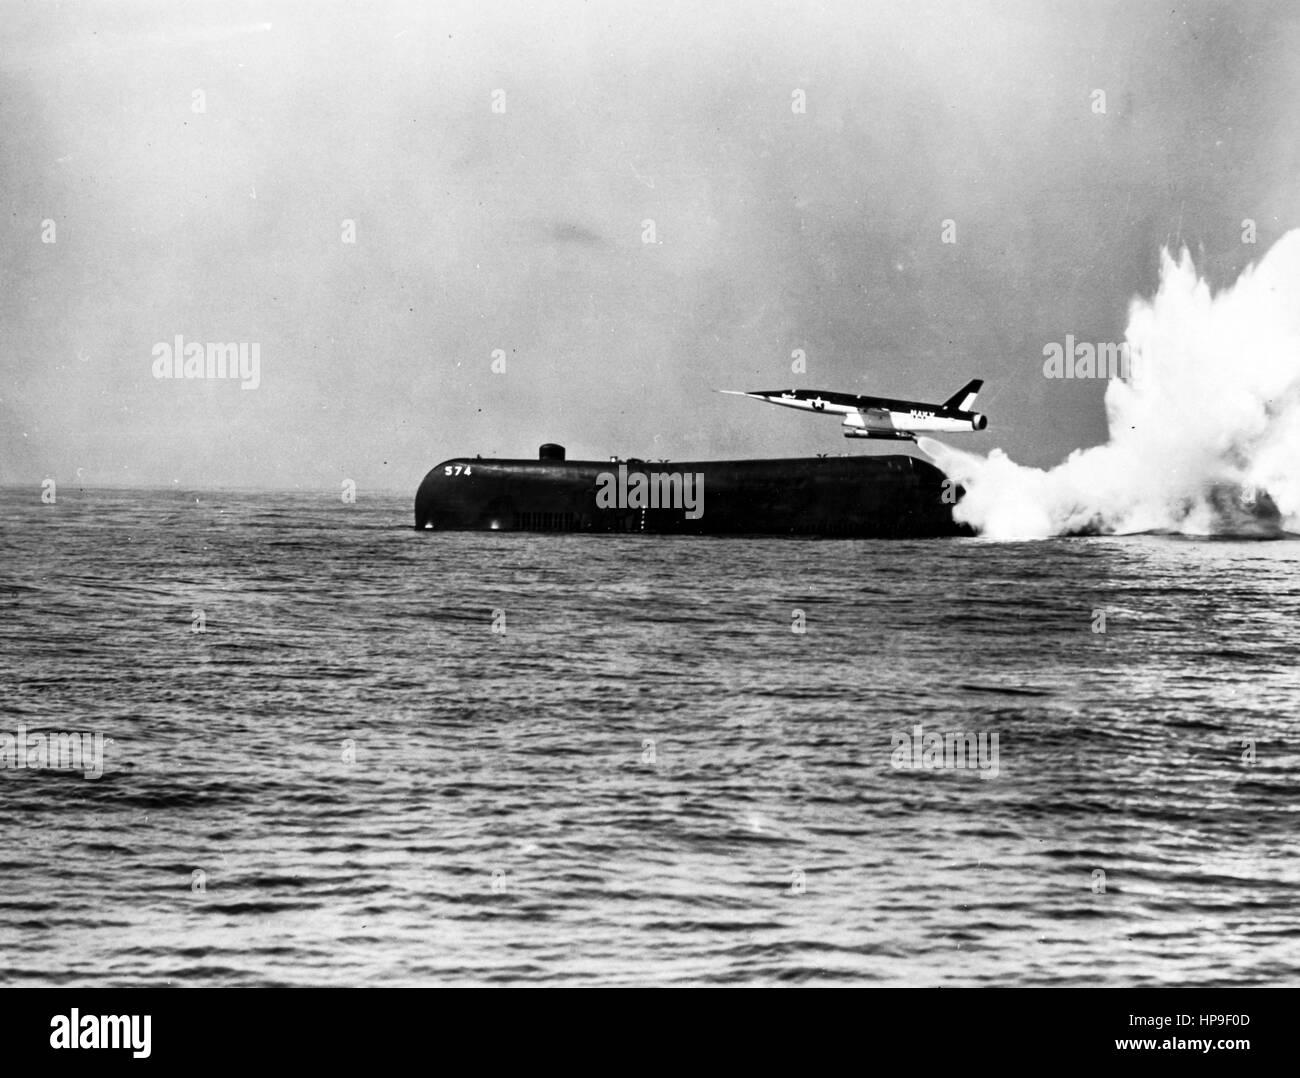 Regulus II i missili cruise,lanciato dal sommergibile Grayback,oceano pacifico,50s Immagini Stock